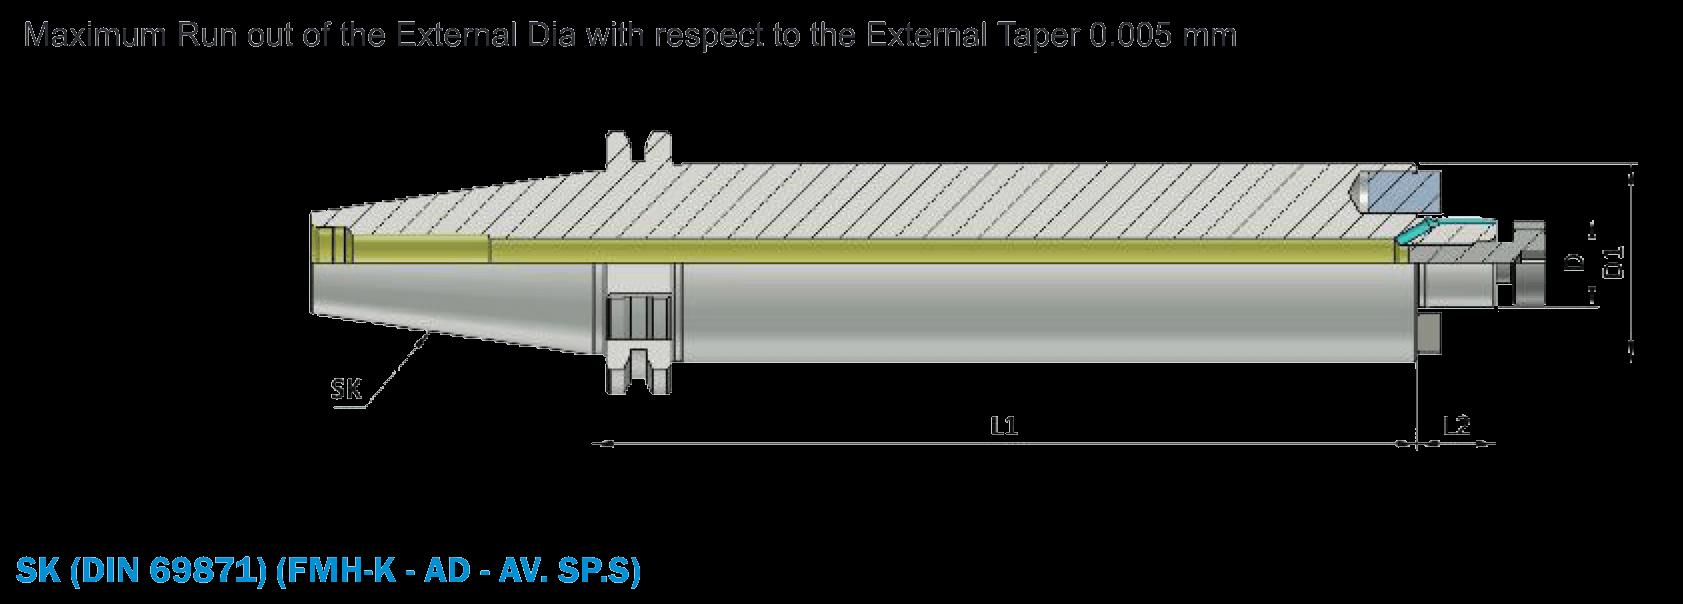 BT40 FMH-K16 200 AD AV SP.S ( BT MAS 403 ) Anti - Vibration Face Mill Holder Through Coolant